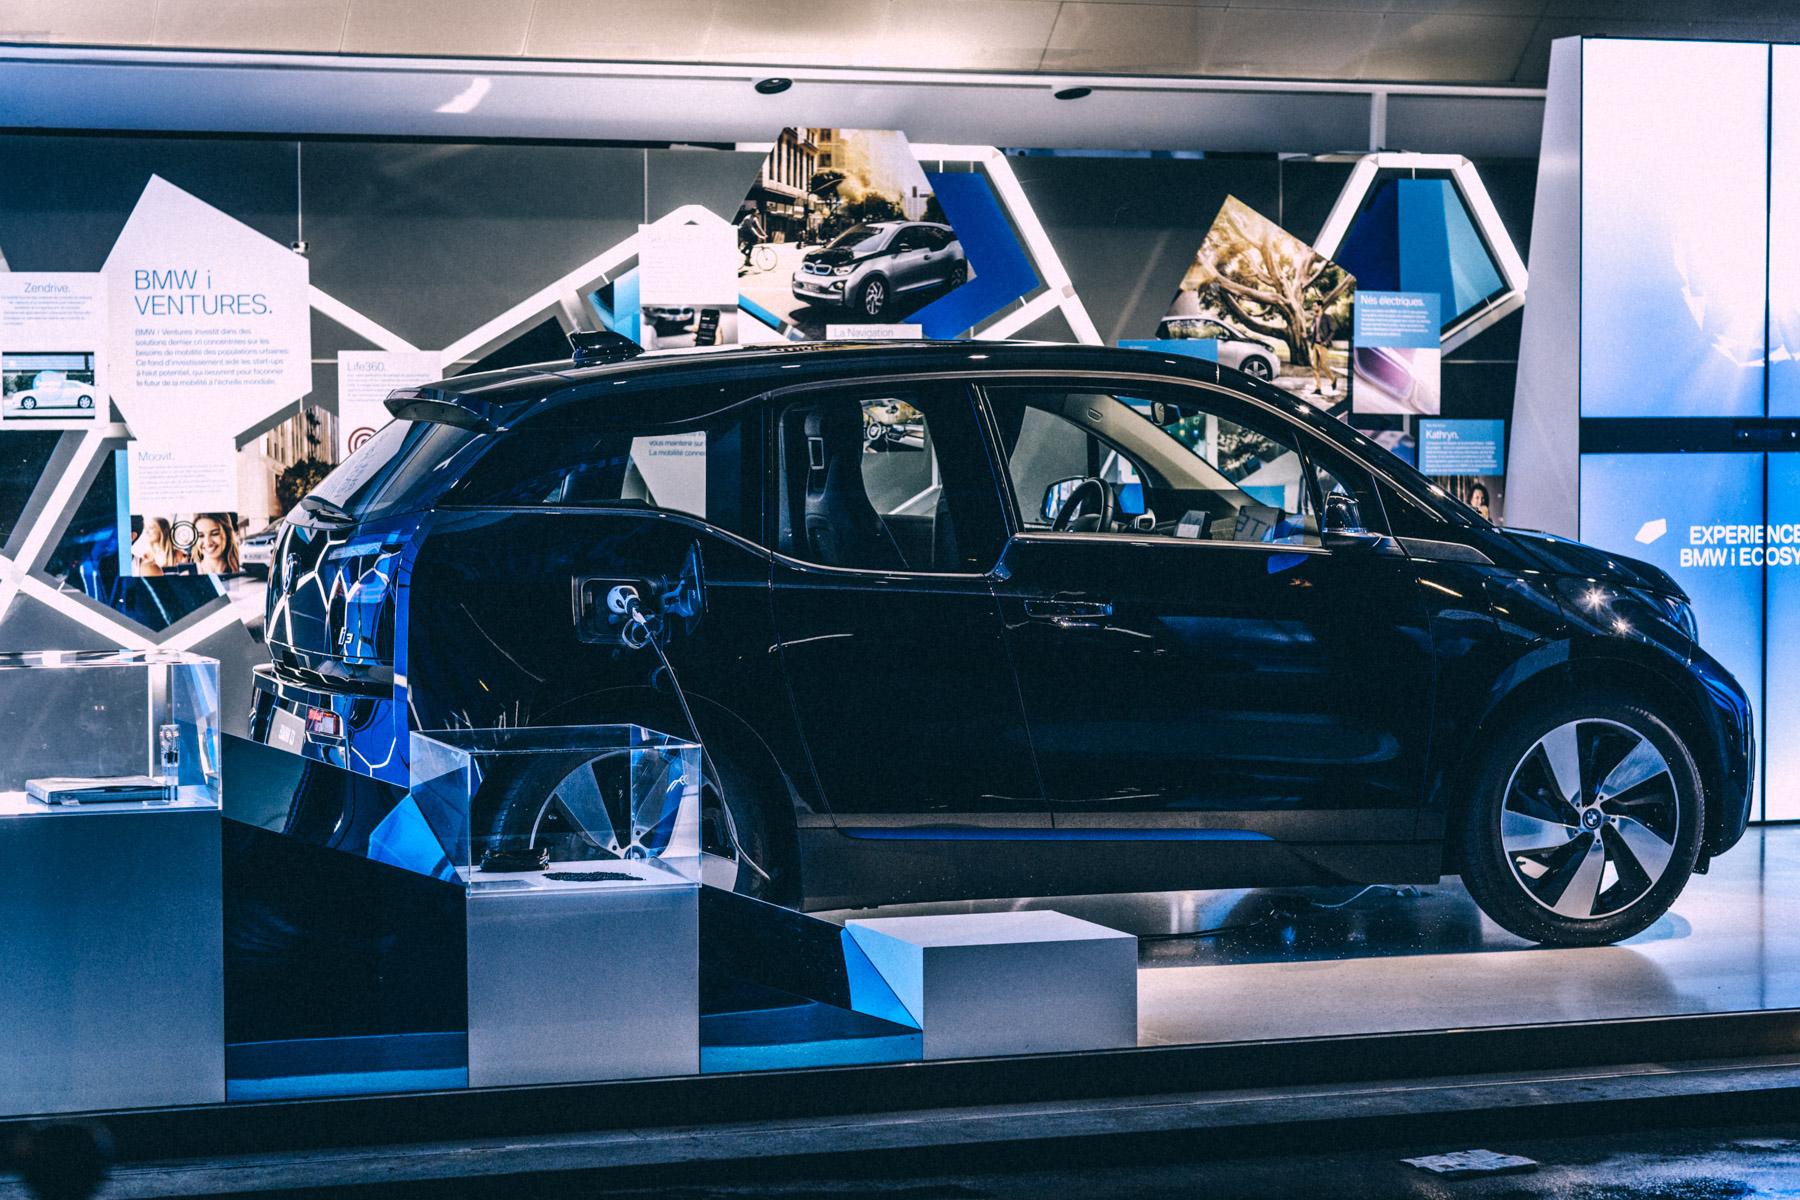 BMW George V EXPERIENCE BMW i ECOSYSYTEM WP20